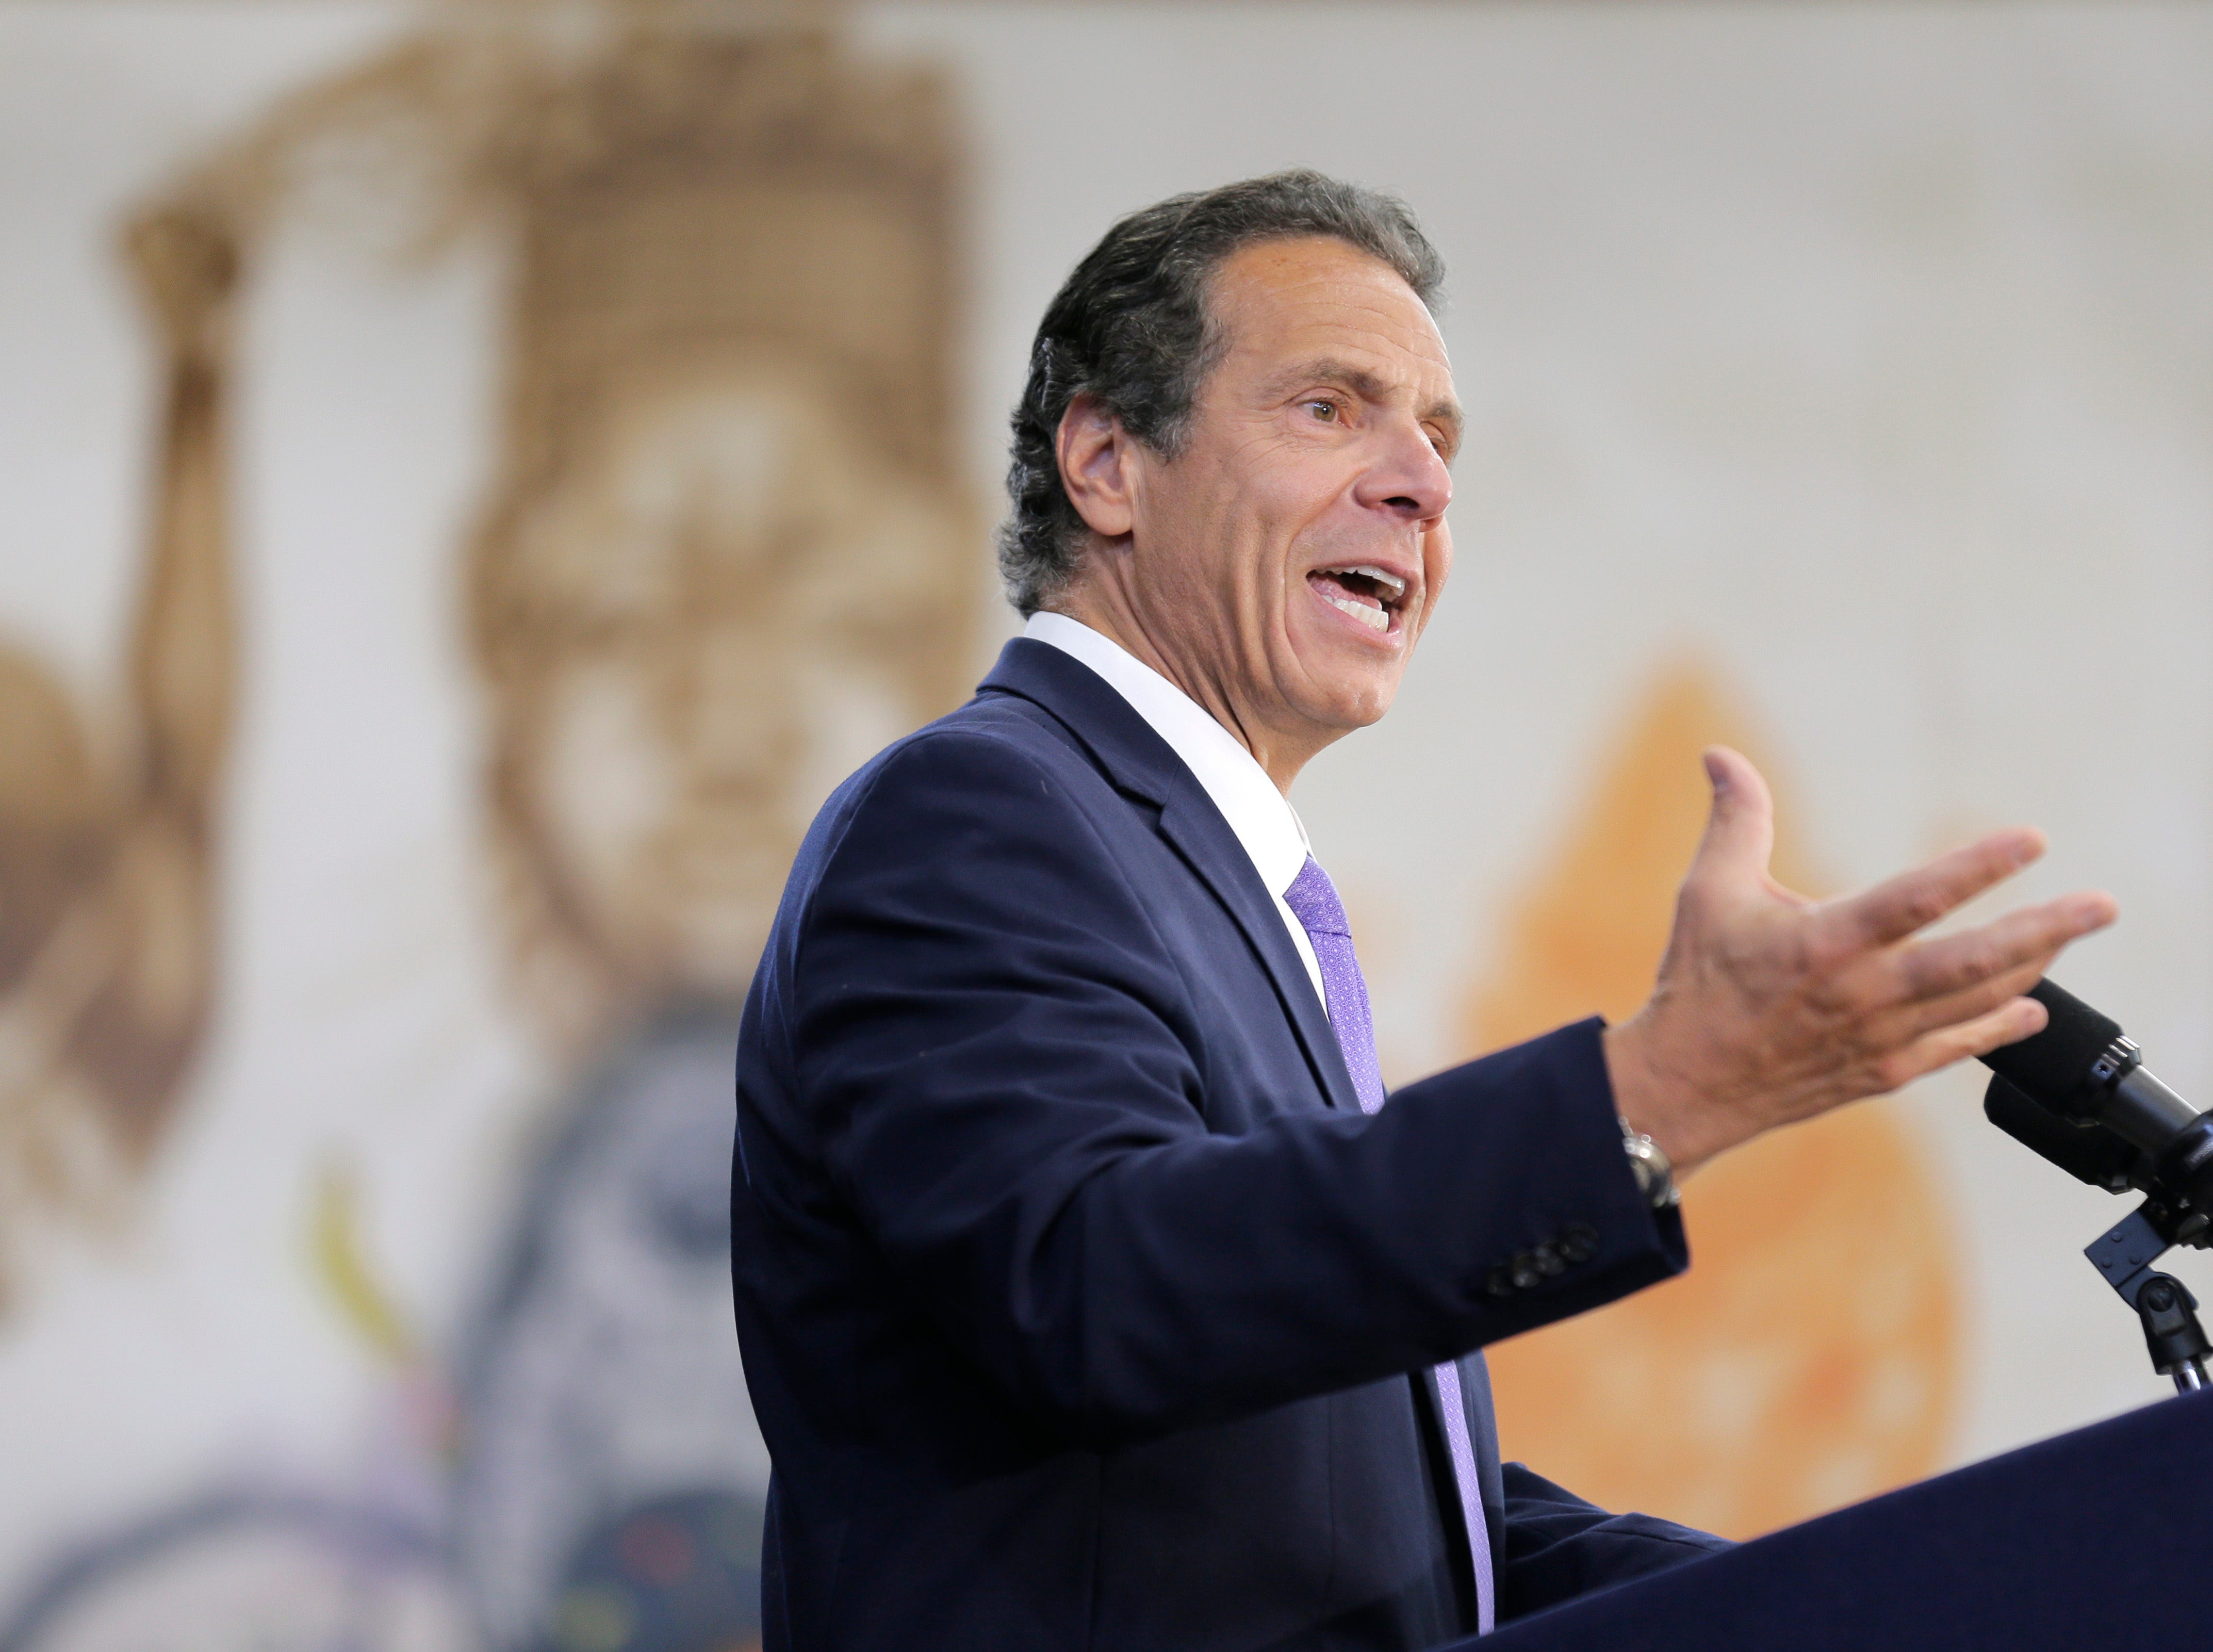 Andrew Cuomo: Legalize recreational marijuana in New York in 2019